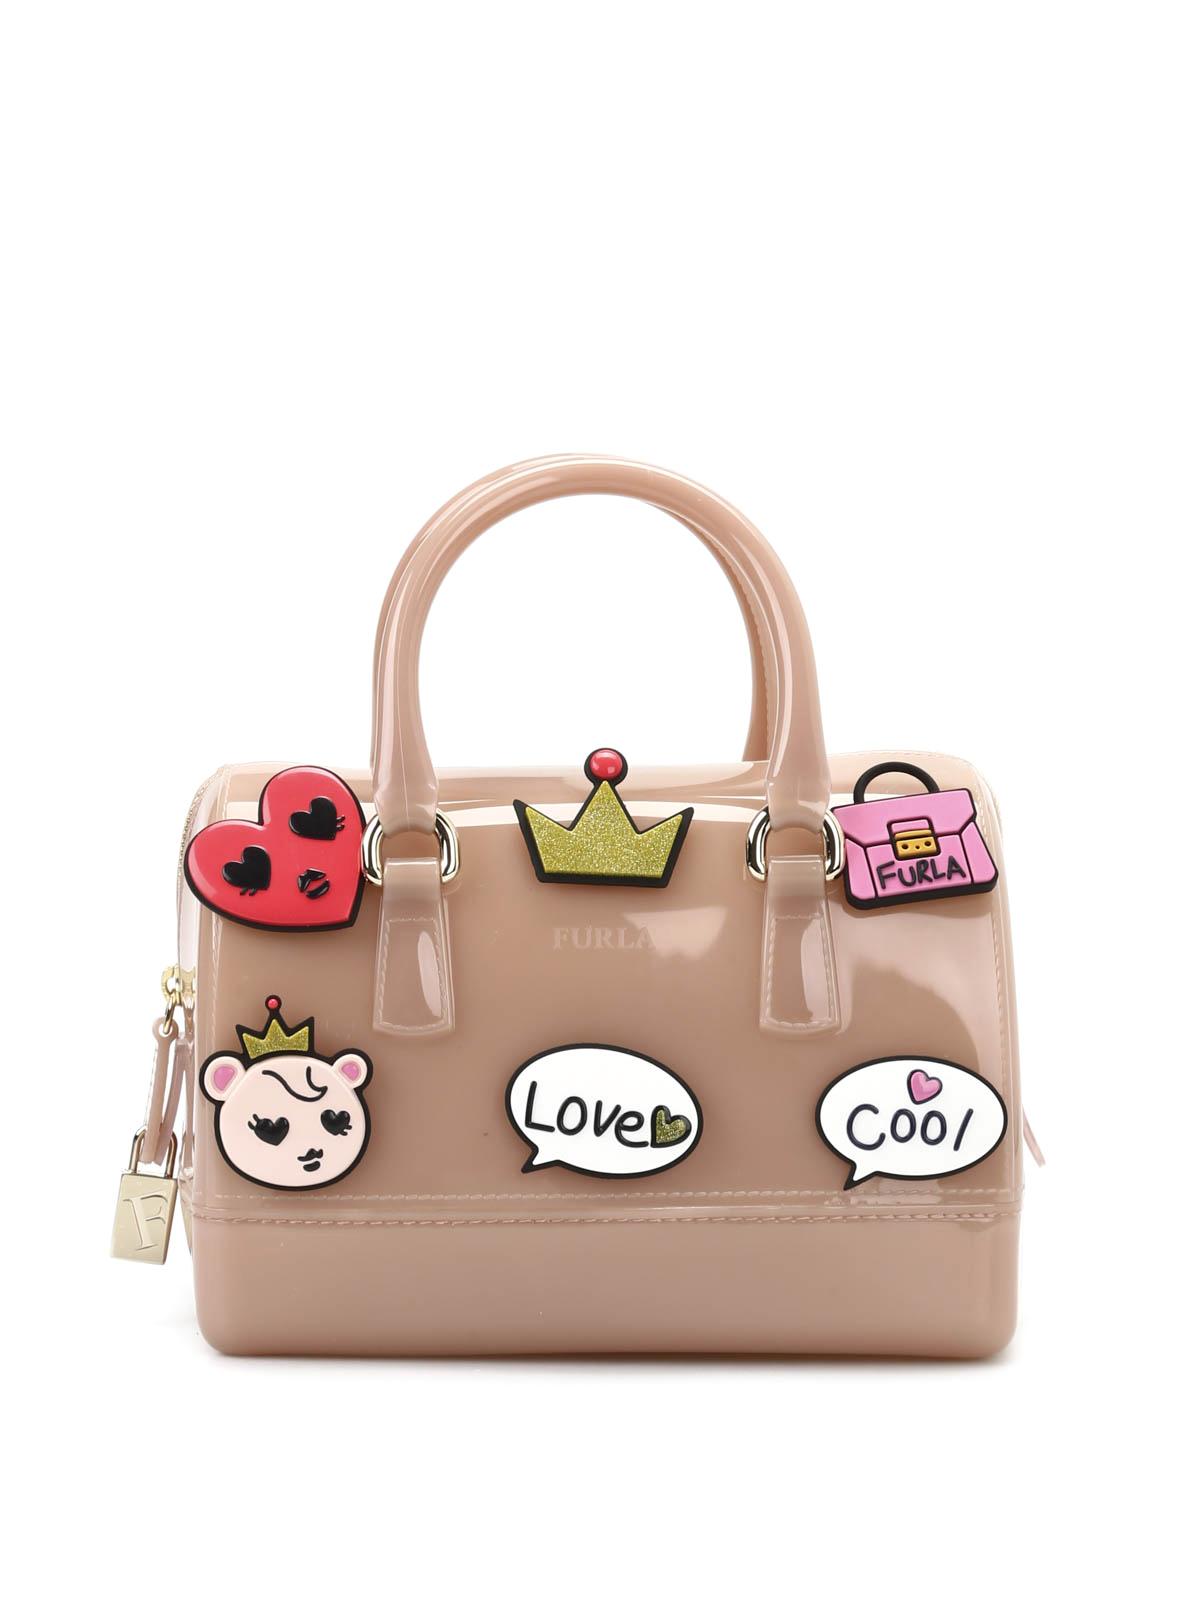 Look - Candy furla bags video